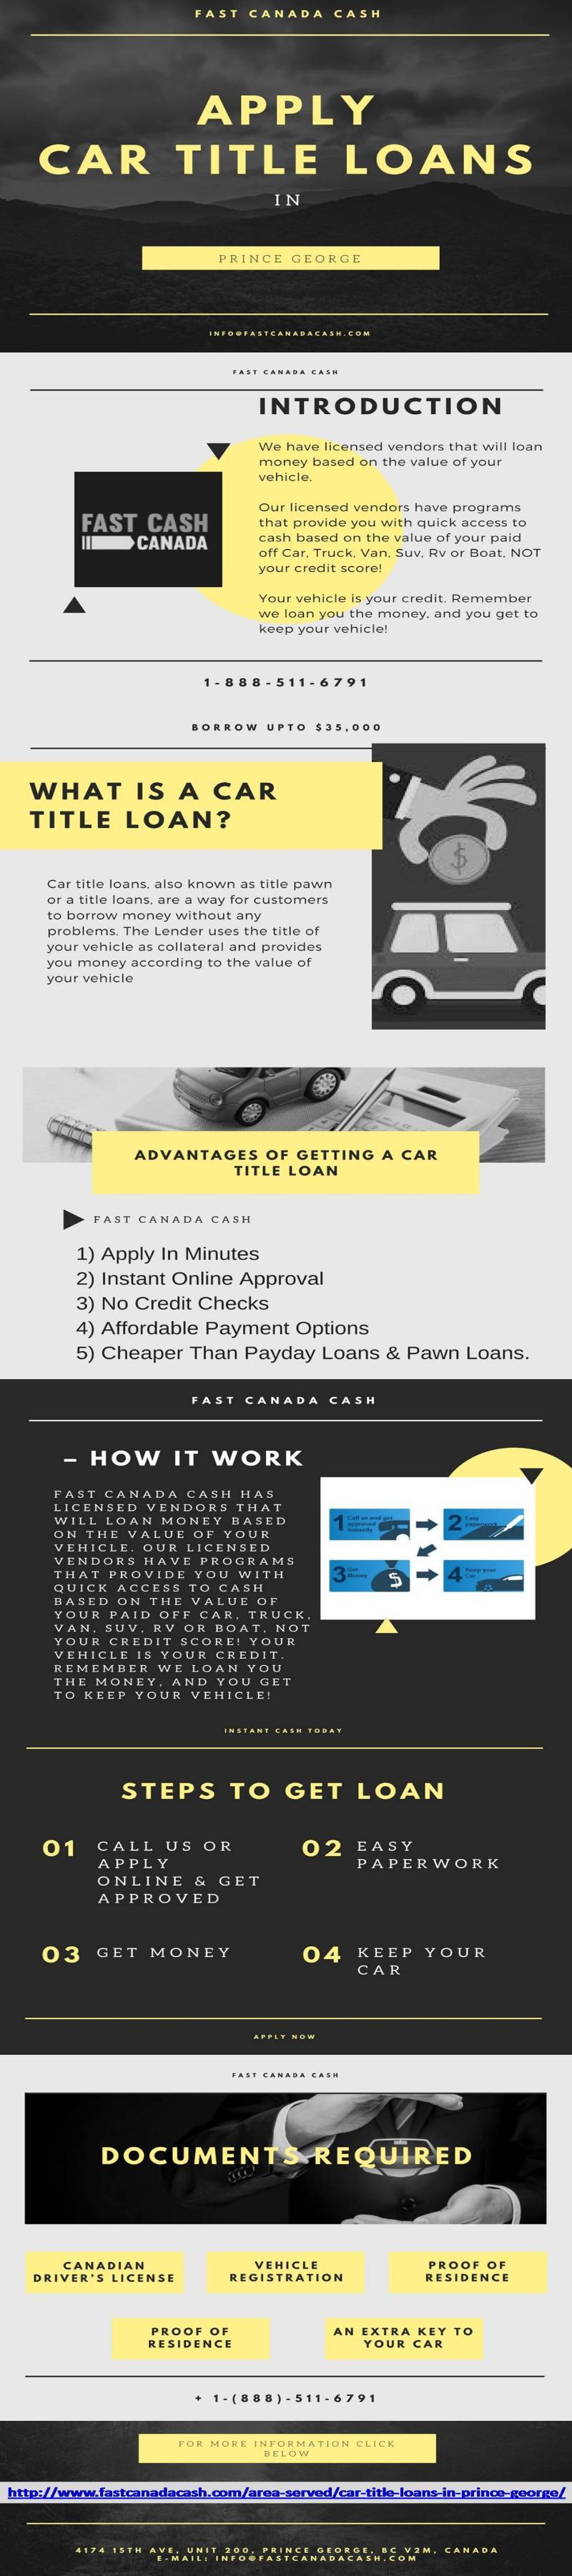 installment loans CT